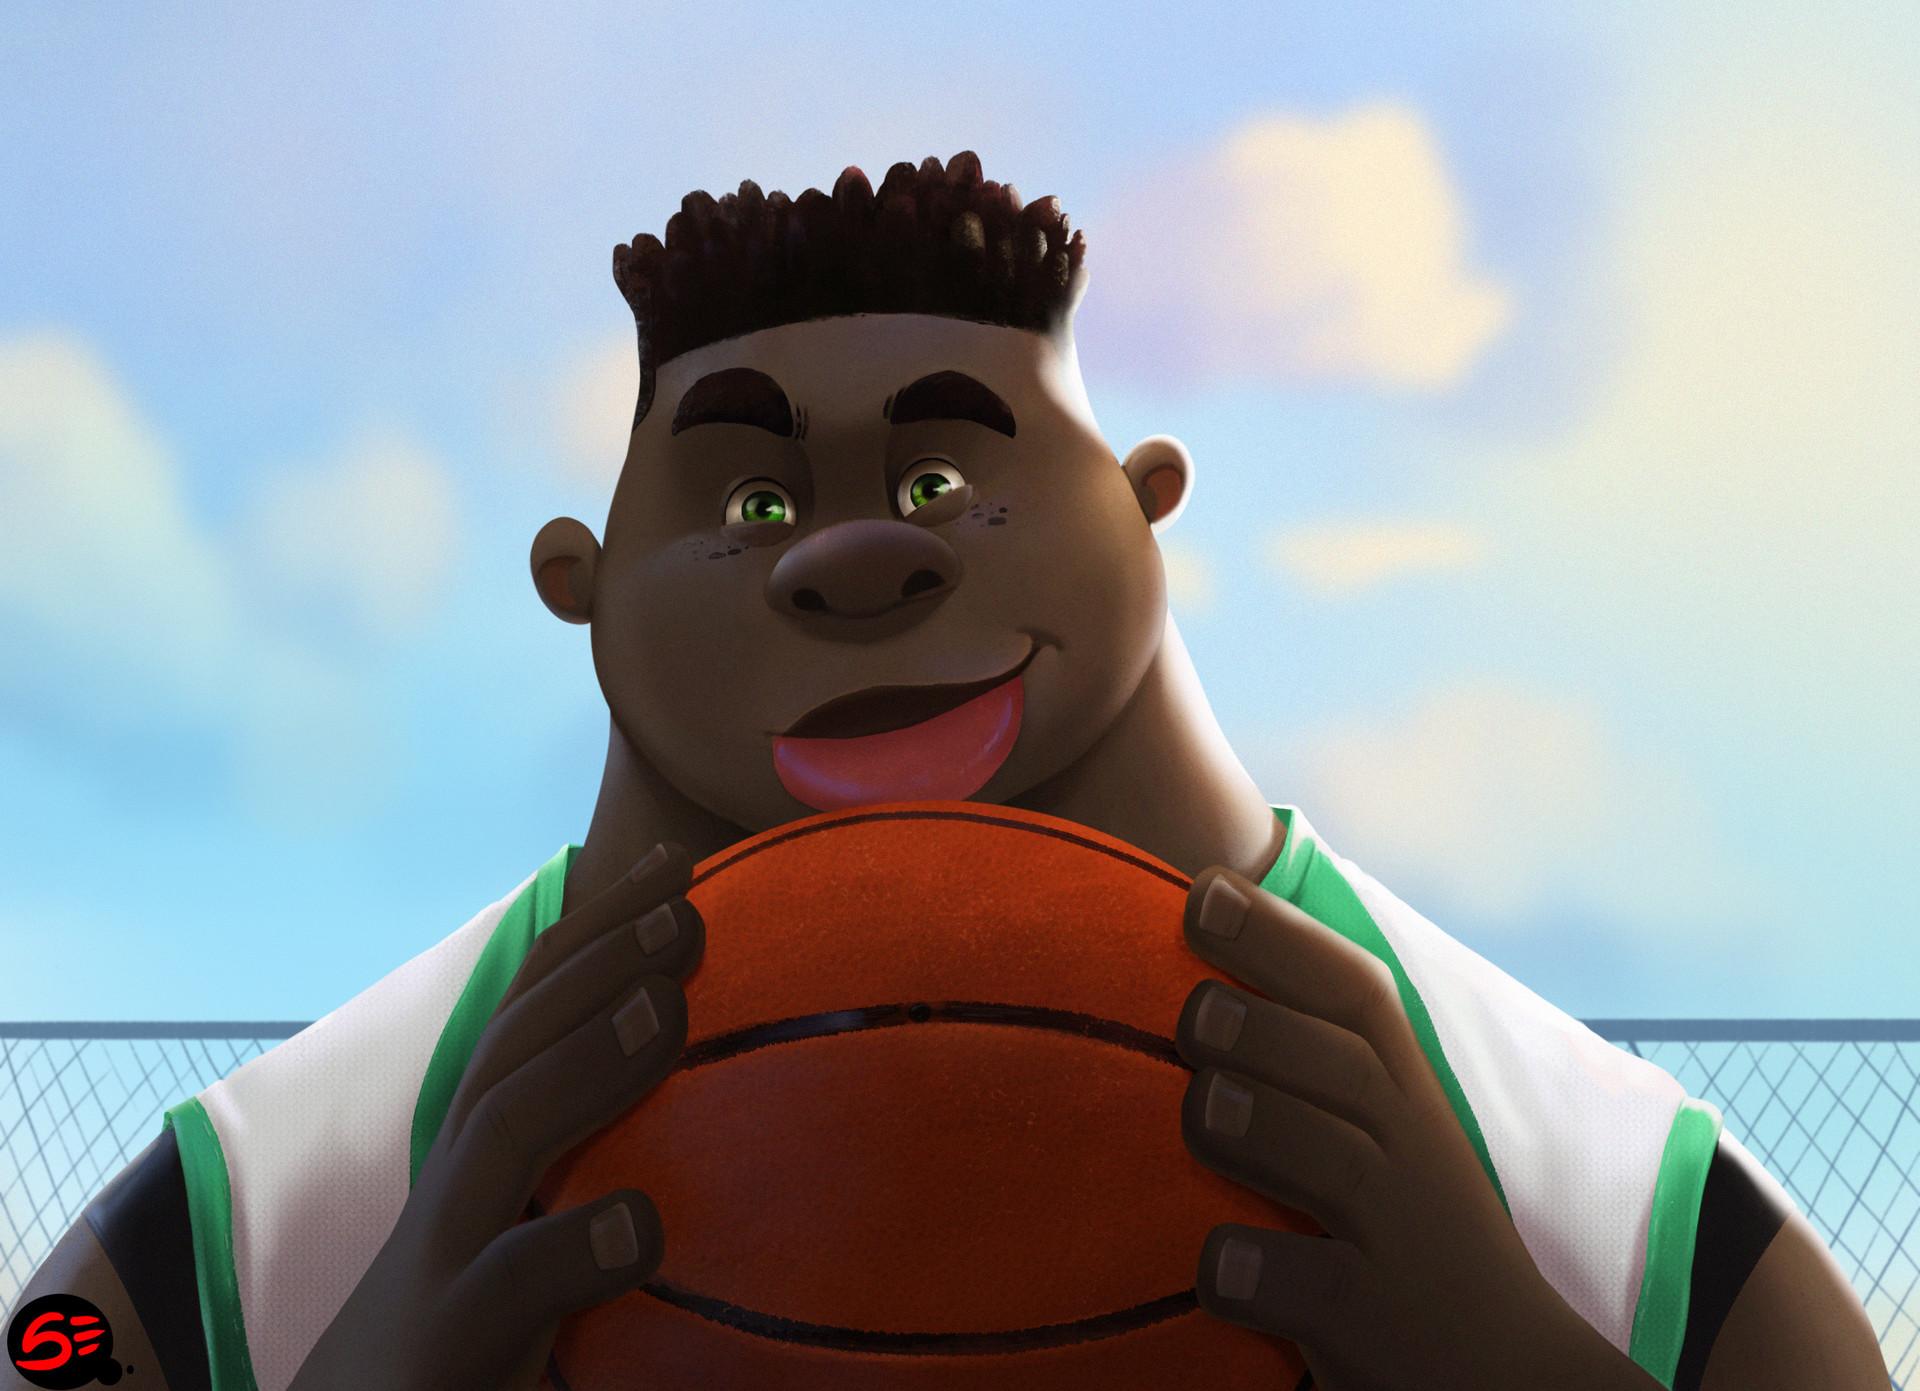 Basketball player 3d illustration by Segun Samson